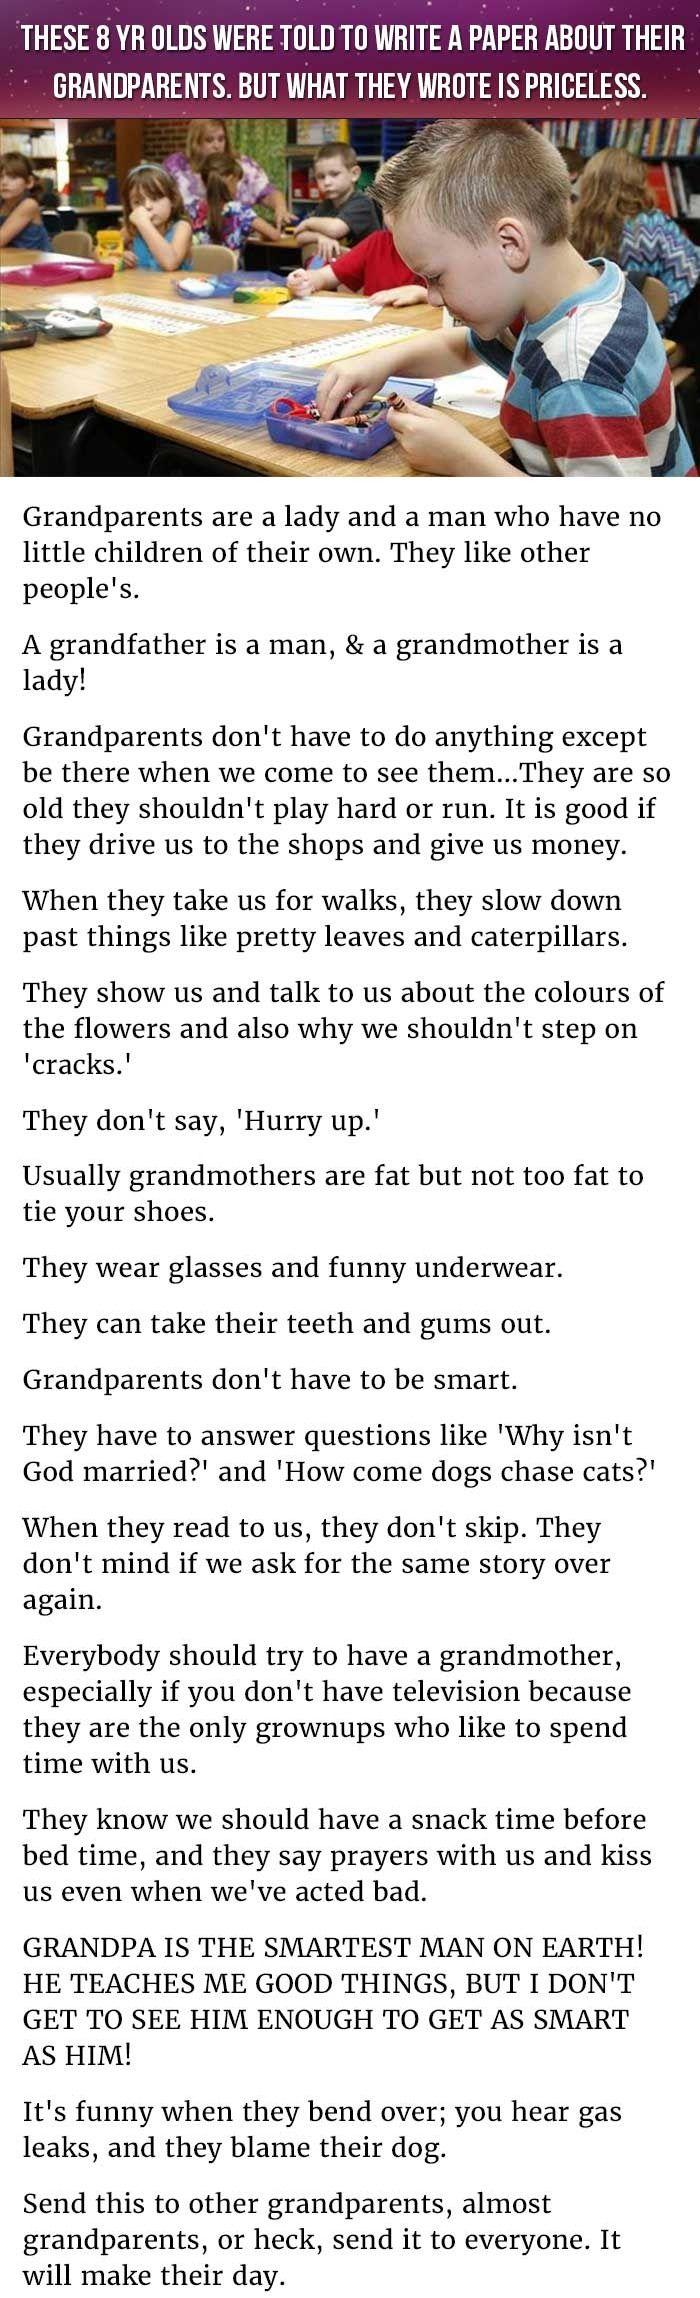 essay about your grandparents